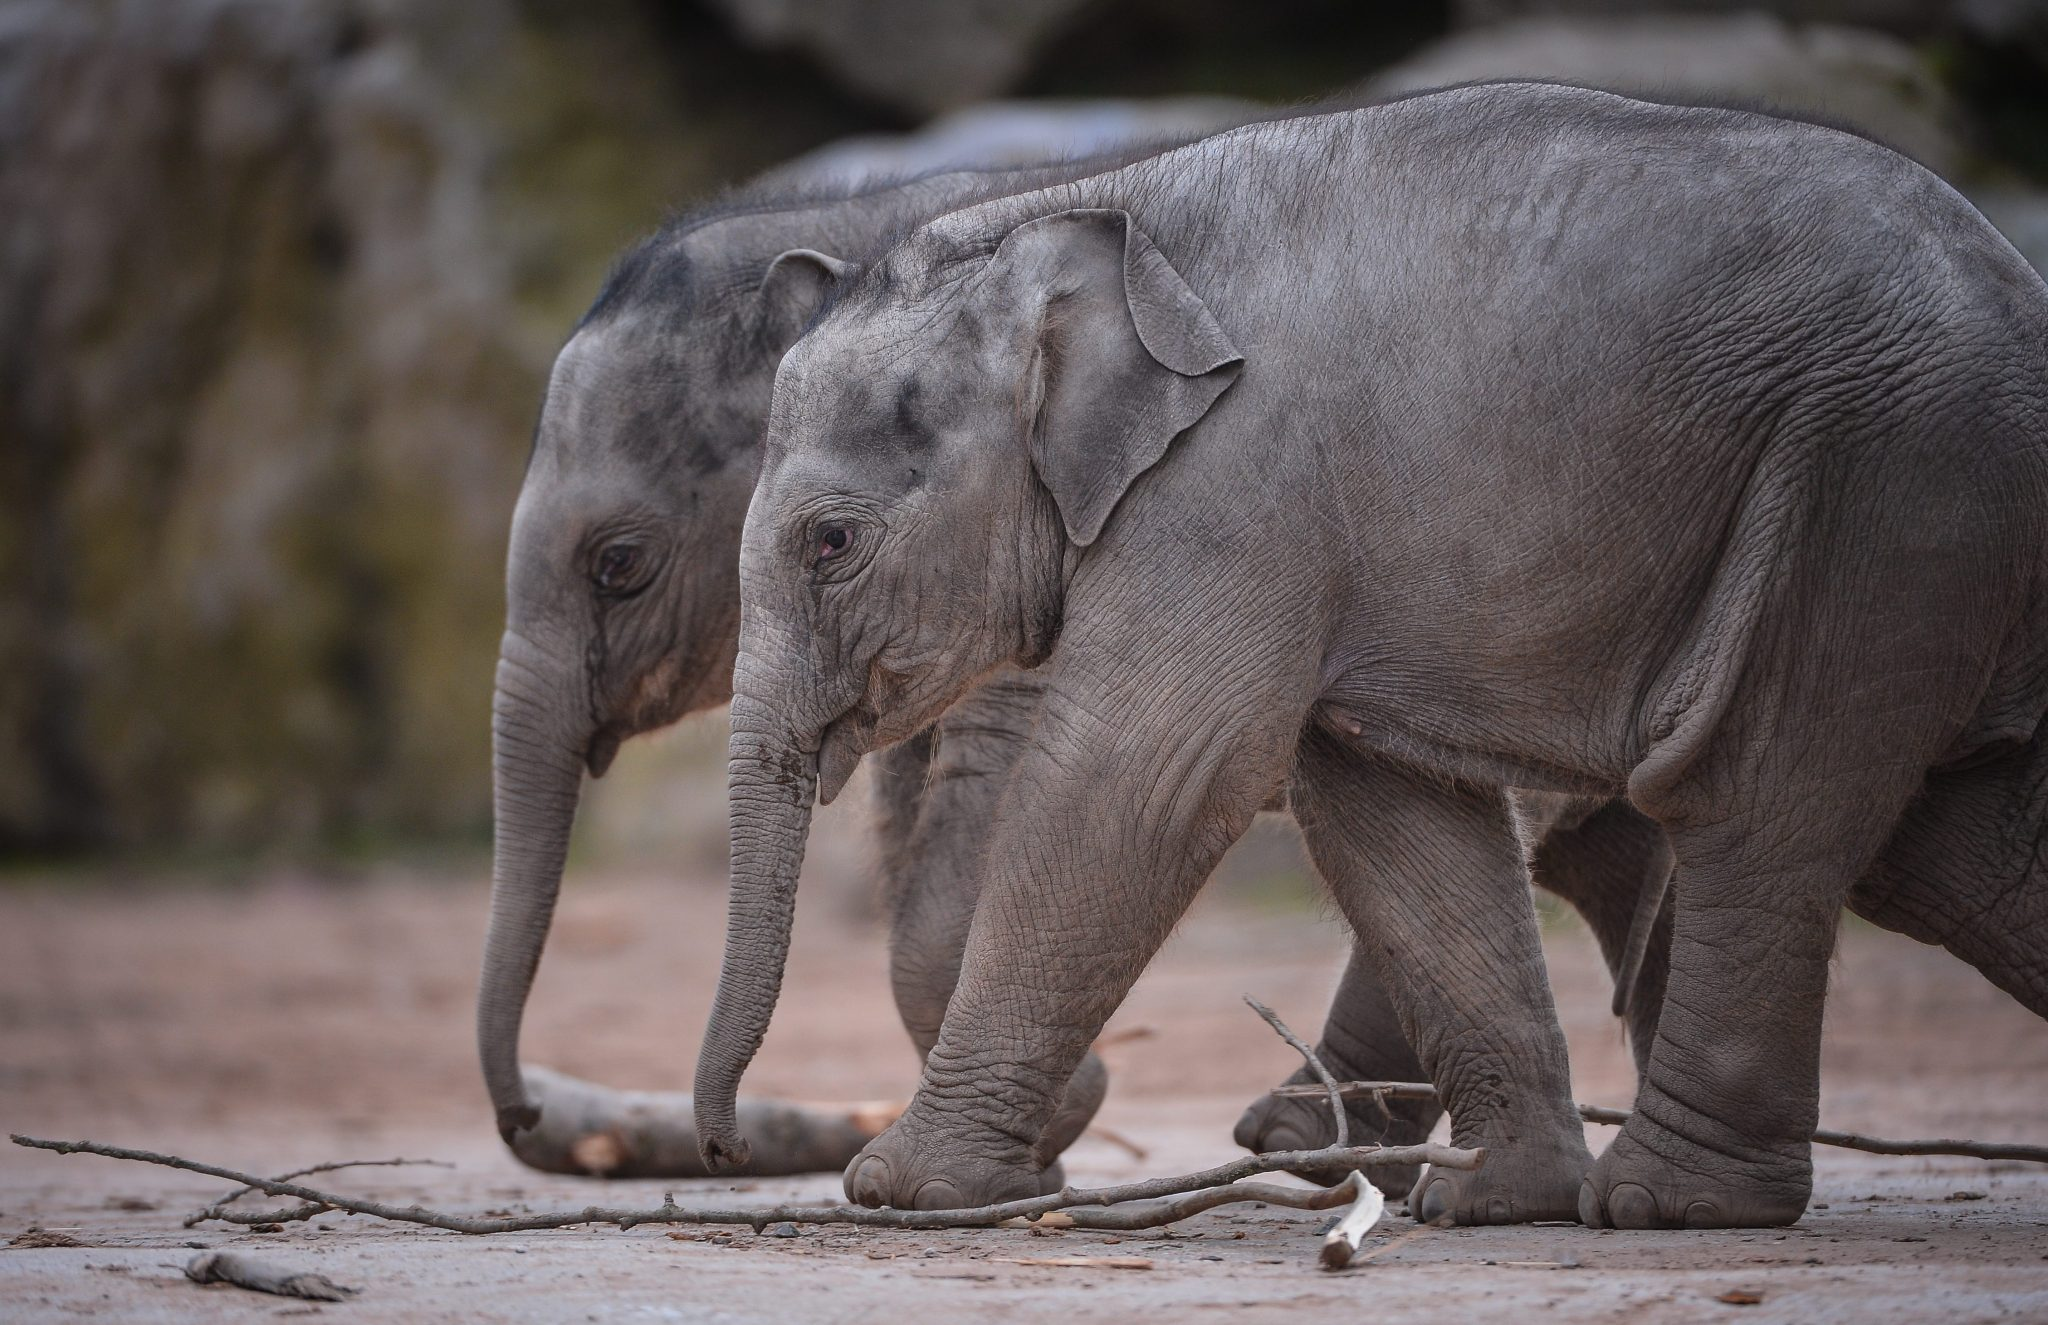 Two Asian elephant calves